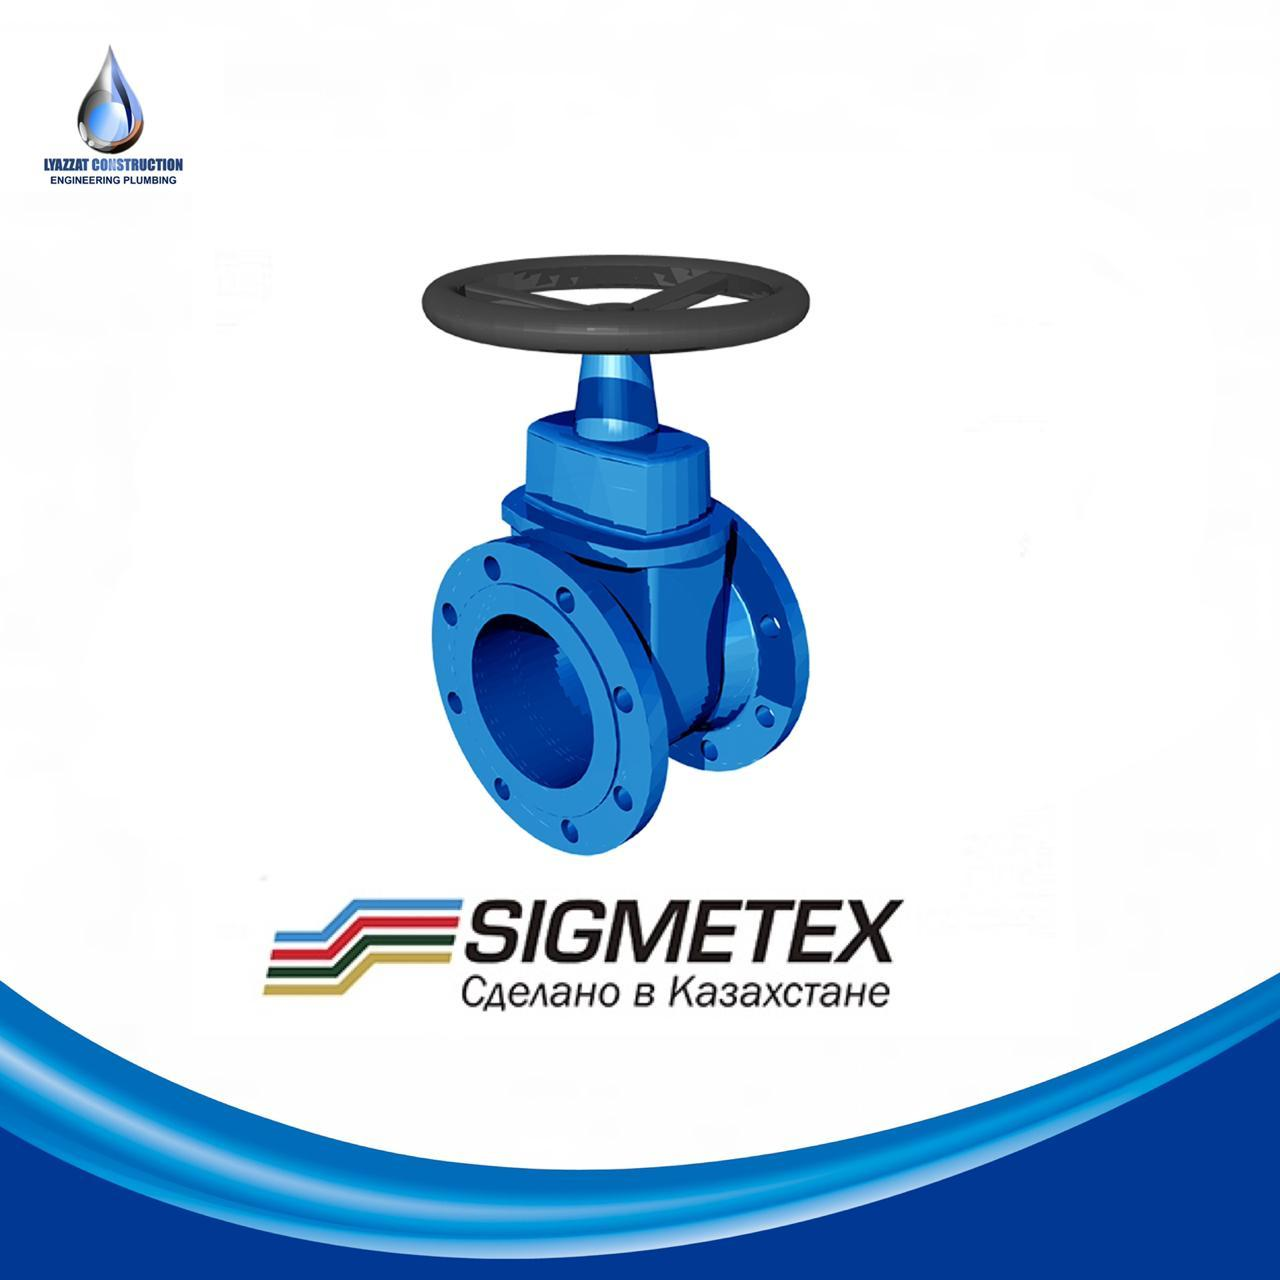 Задвижка Sigmetex DN 200 (Сигметэкс)